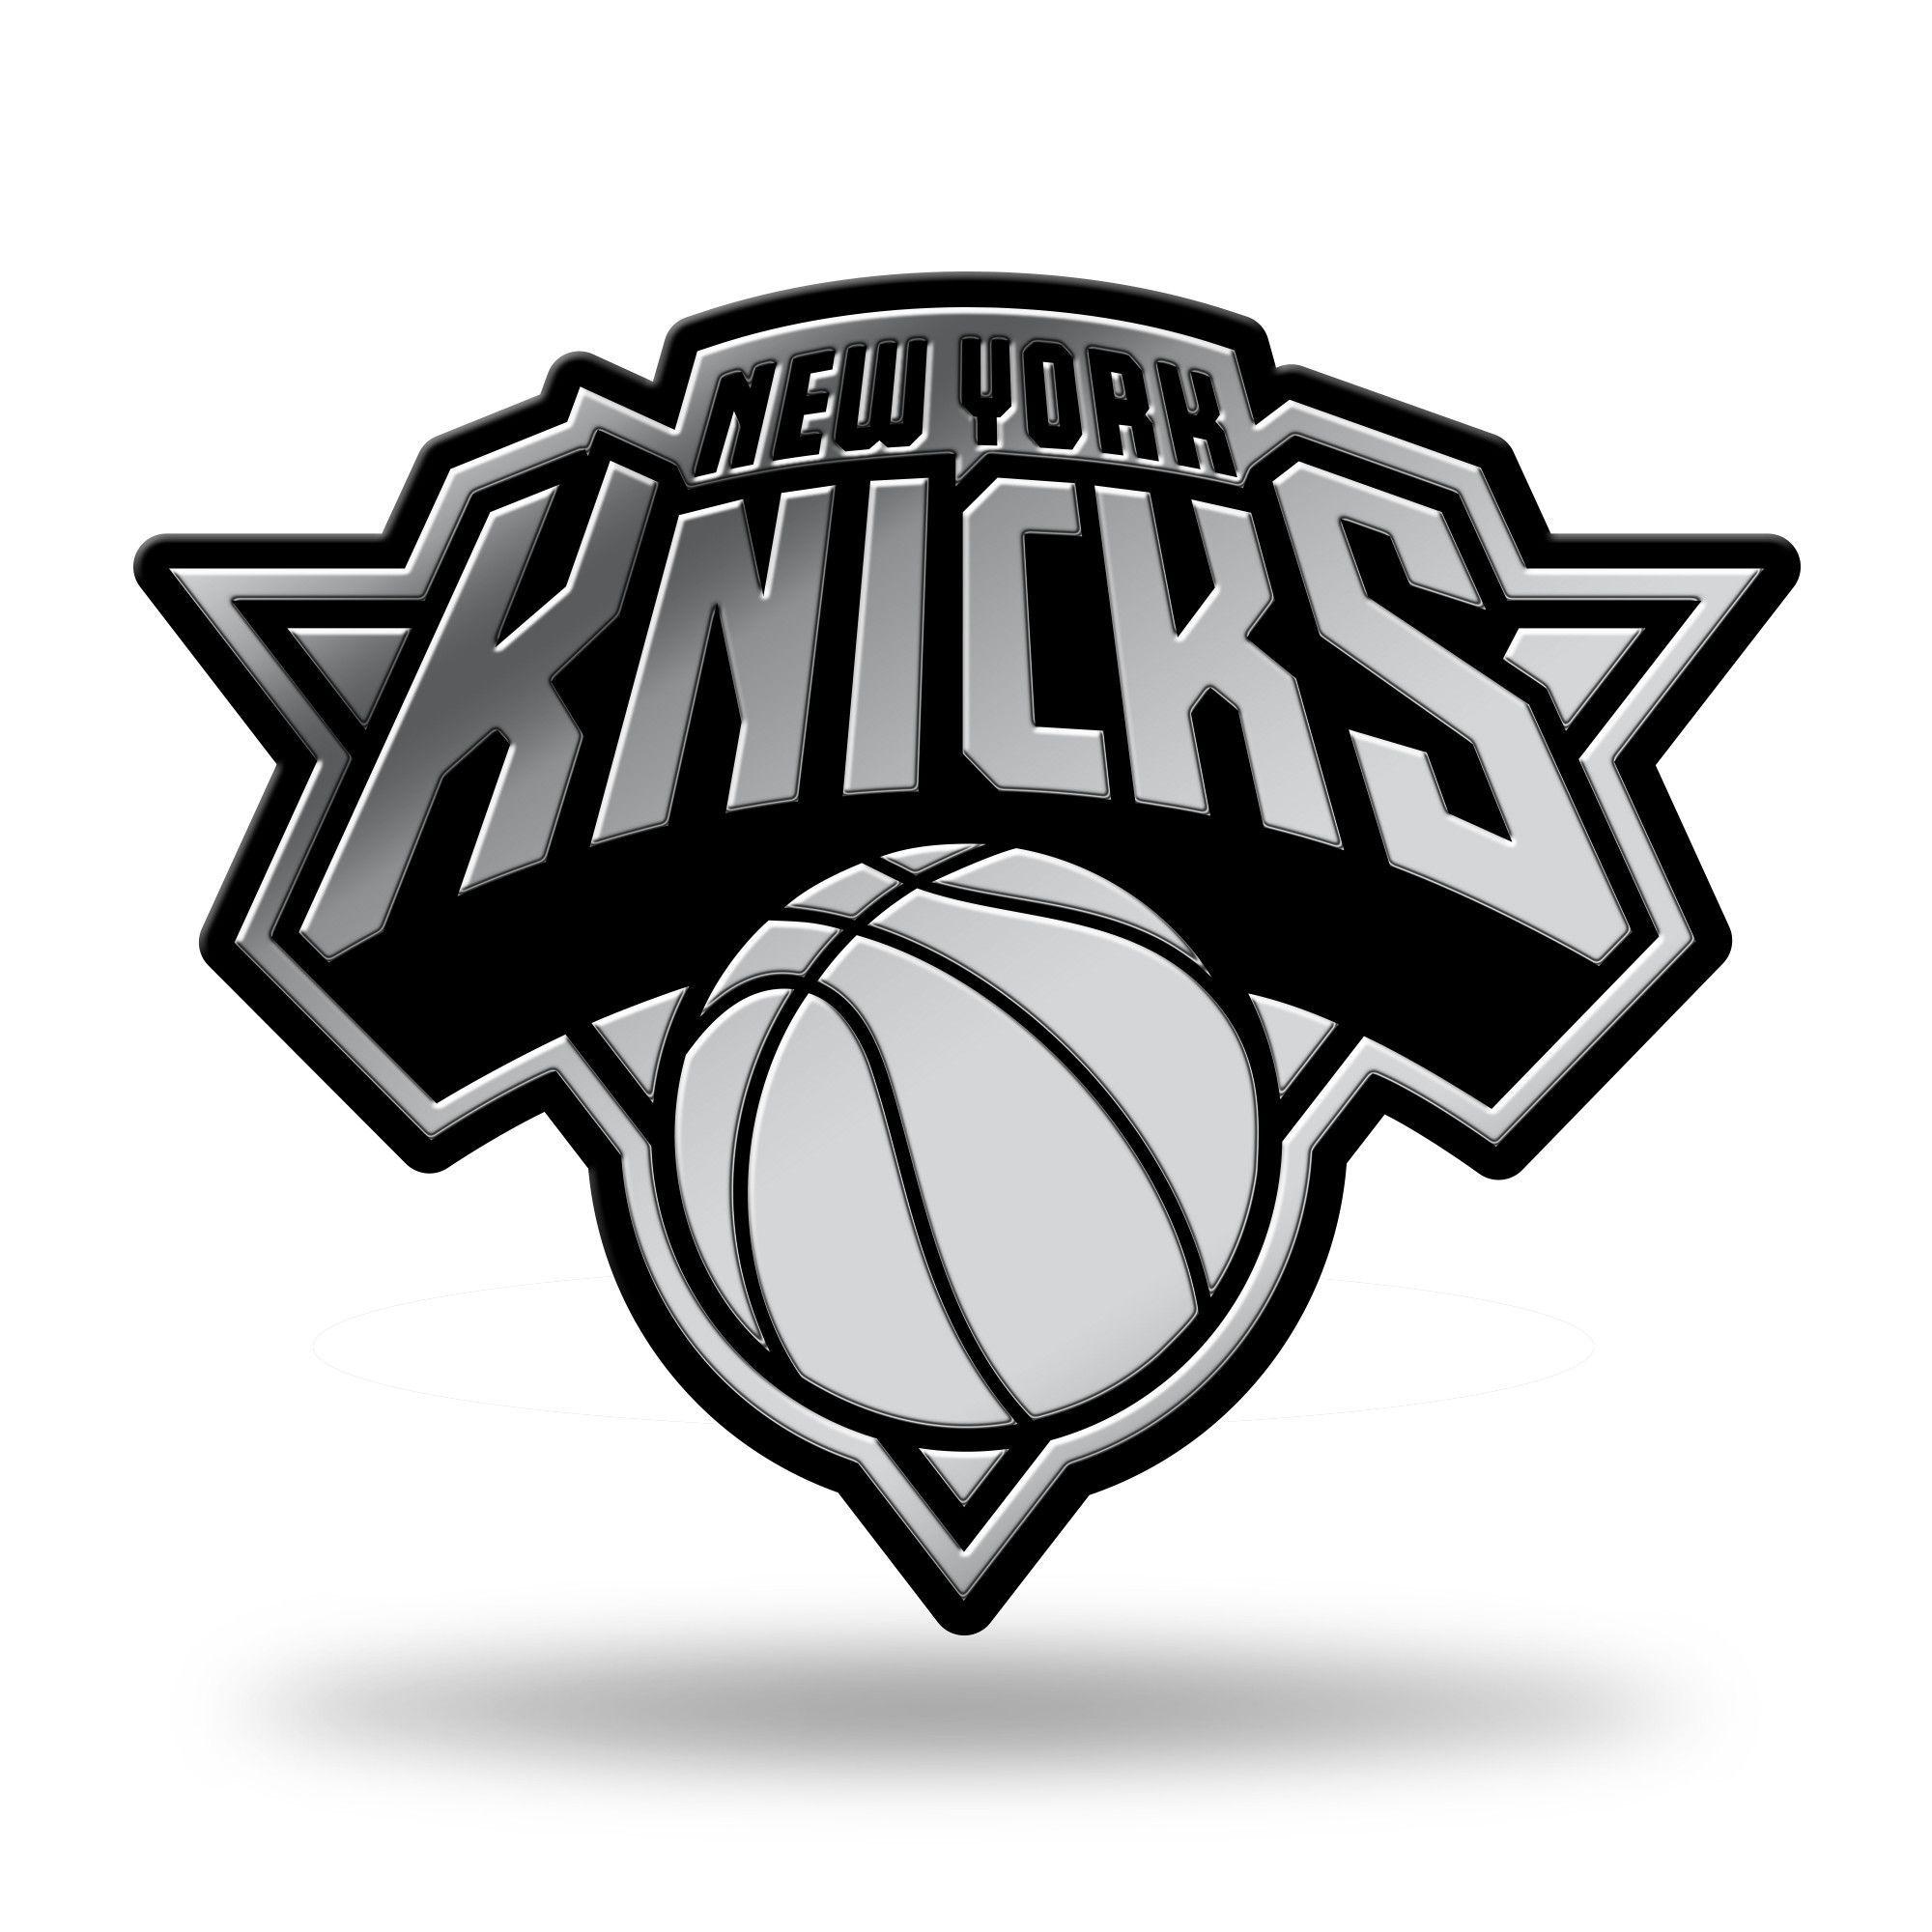 New York Knicks NBA Rico Industries  Laser Cut Inlaid Standard Chrome License Plate Frame